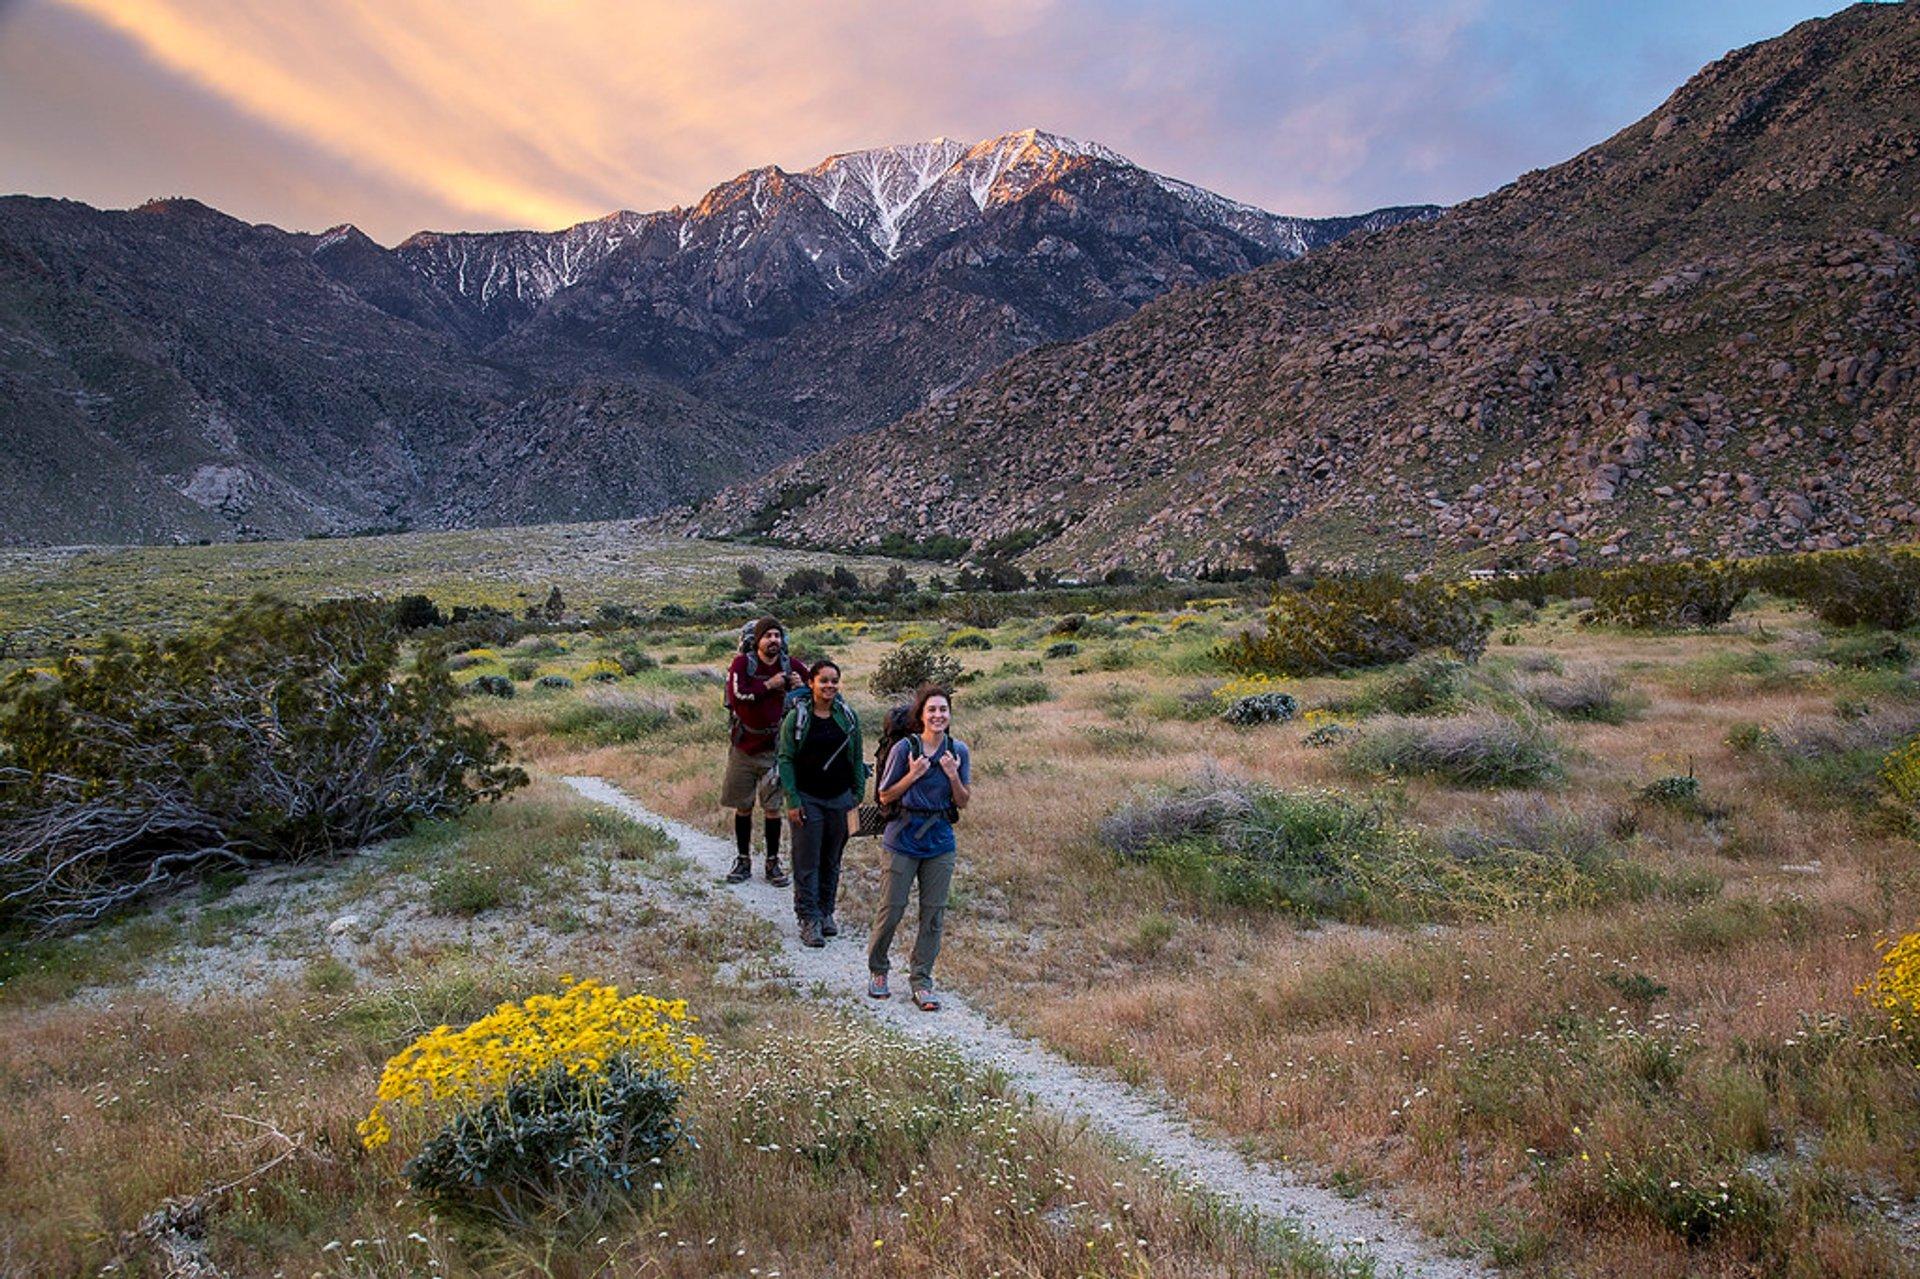 Pacific Crest Trail in California - Best Season 2019